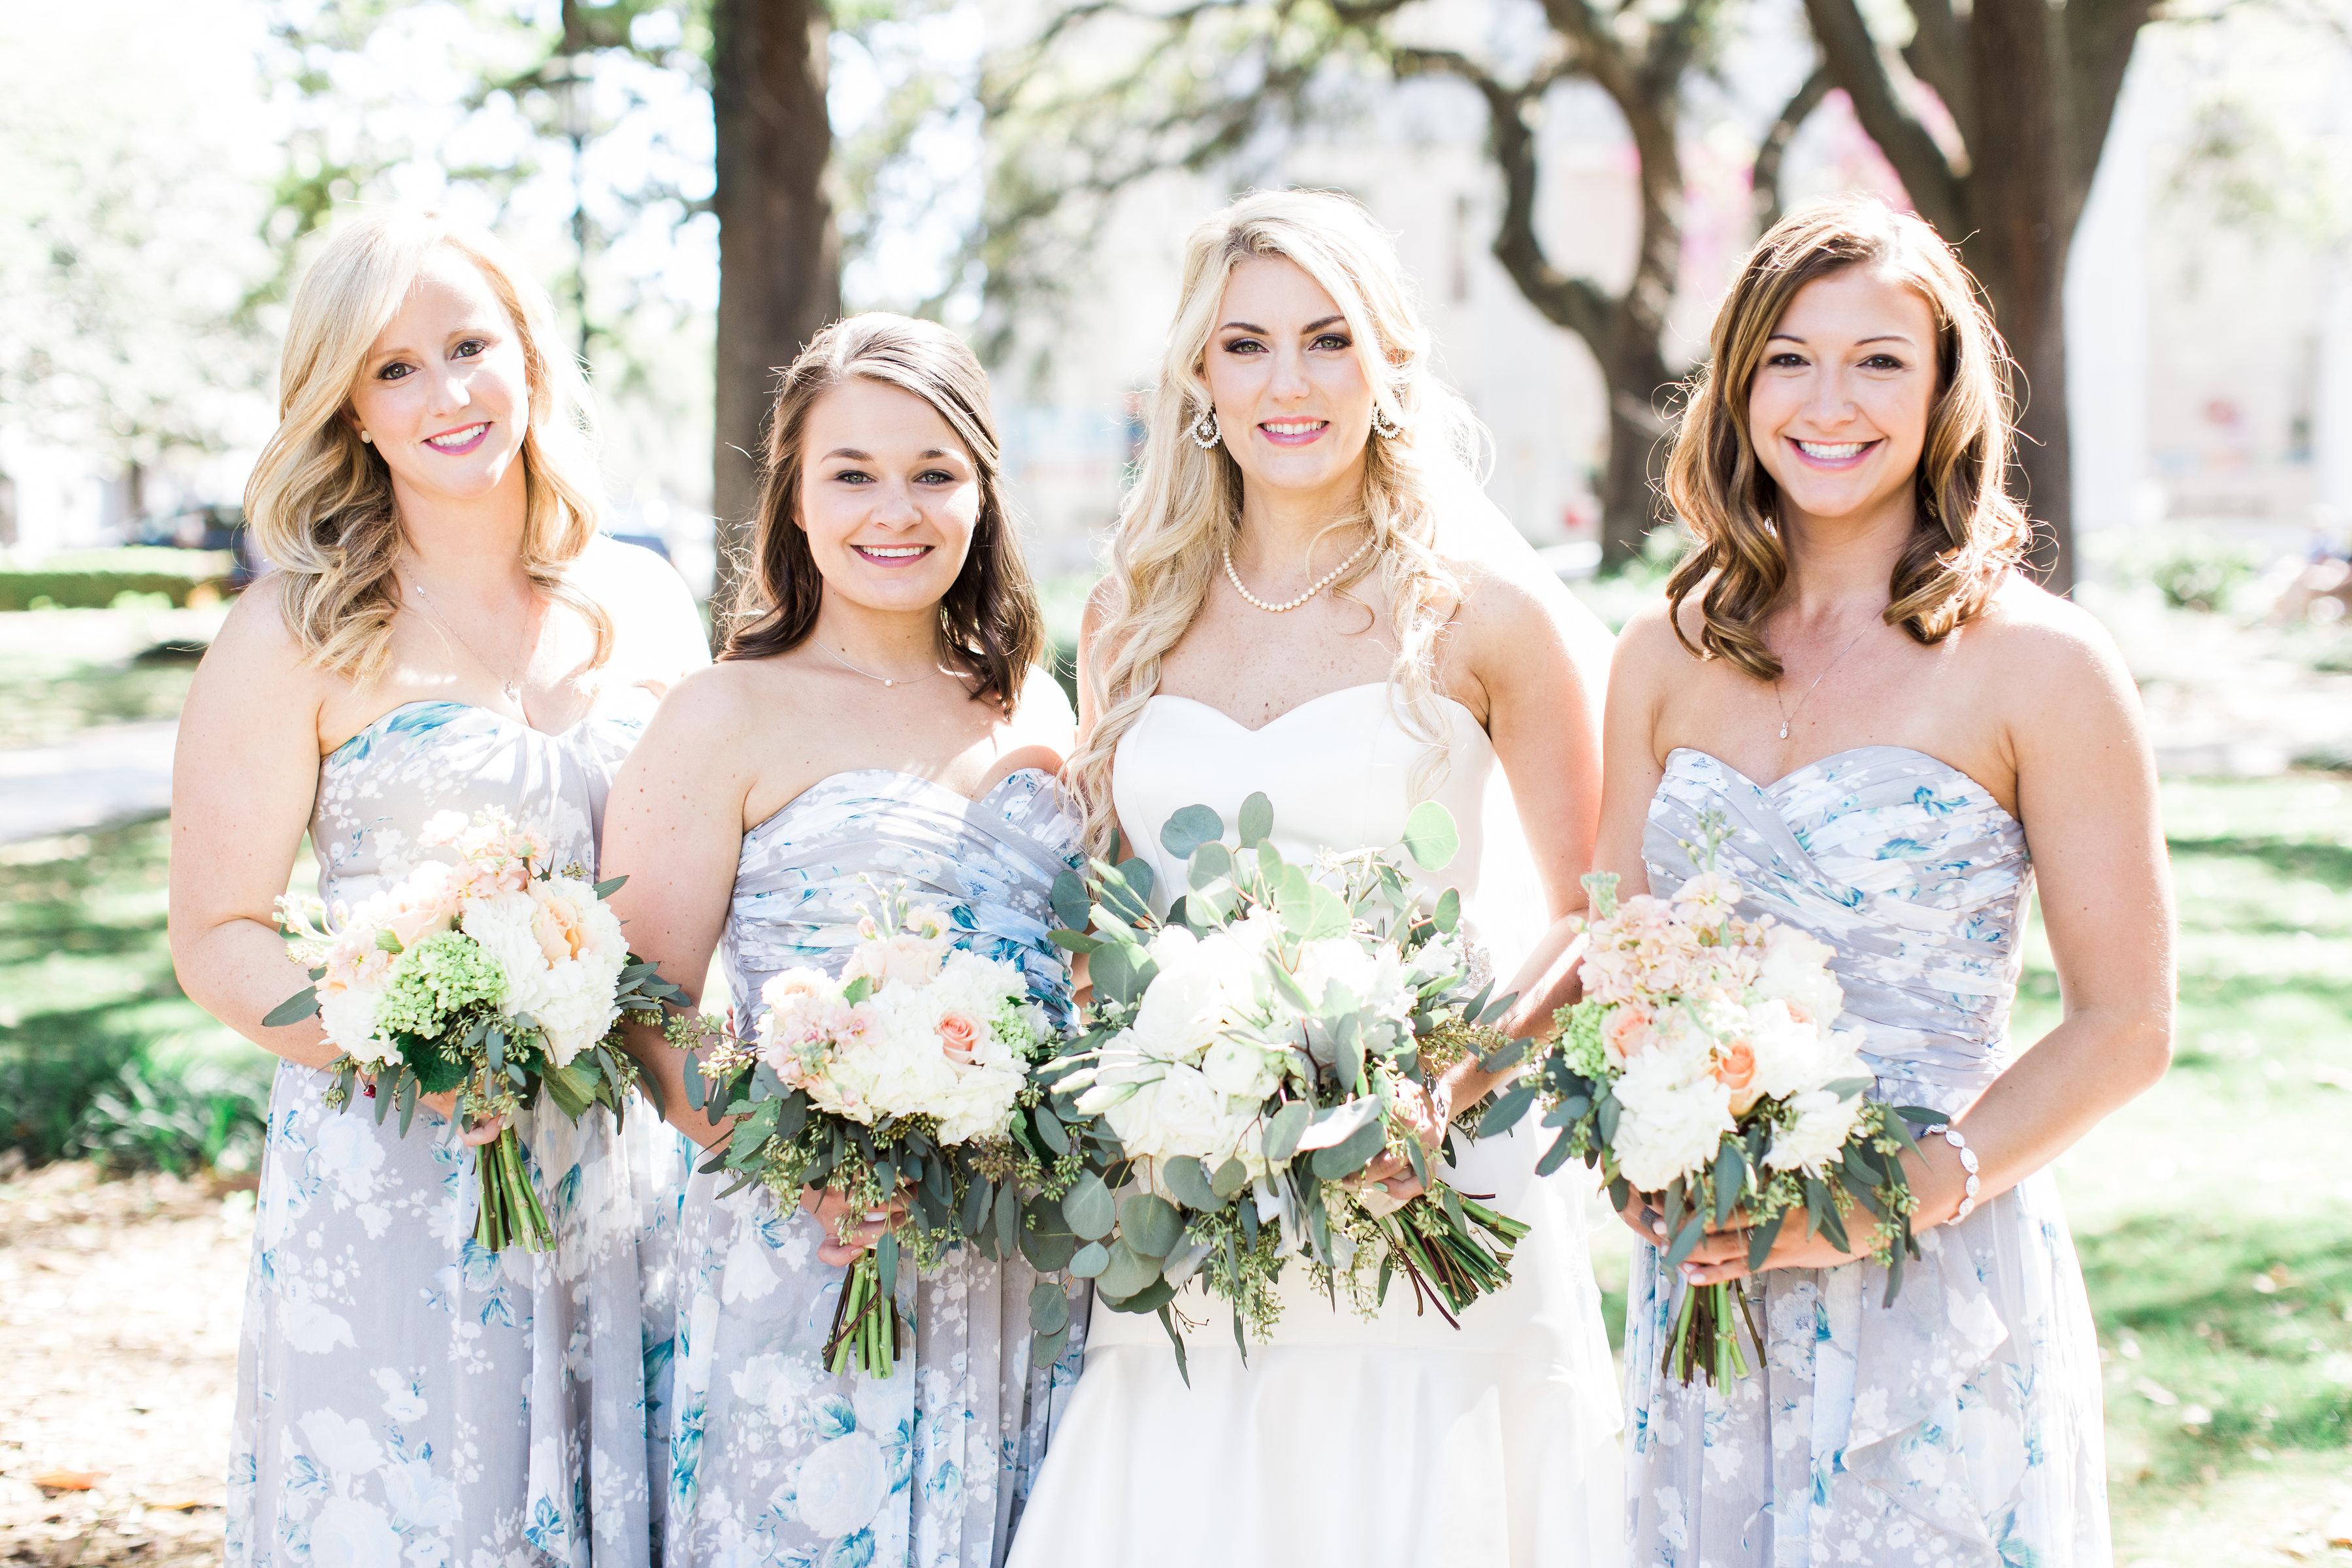 aptbphotography_colorado-springs-wedding-hair-stylist-makeup